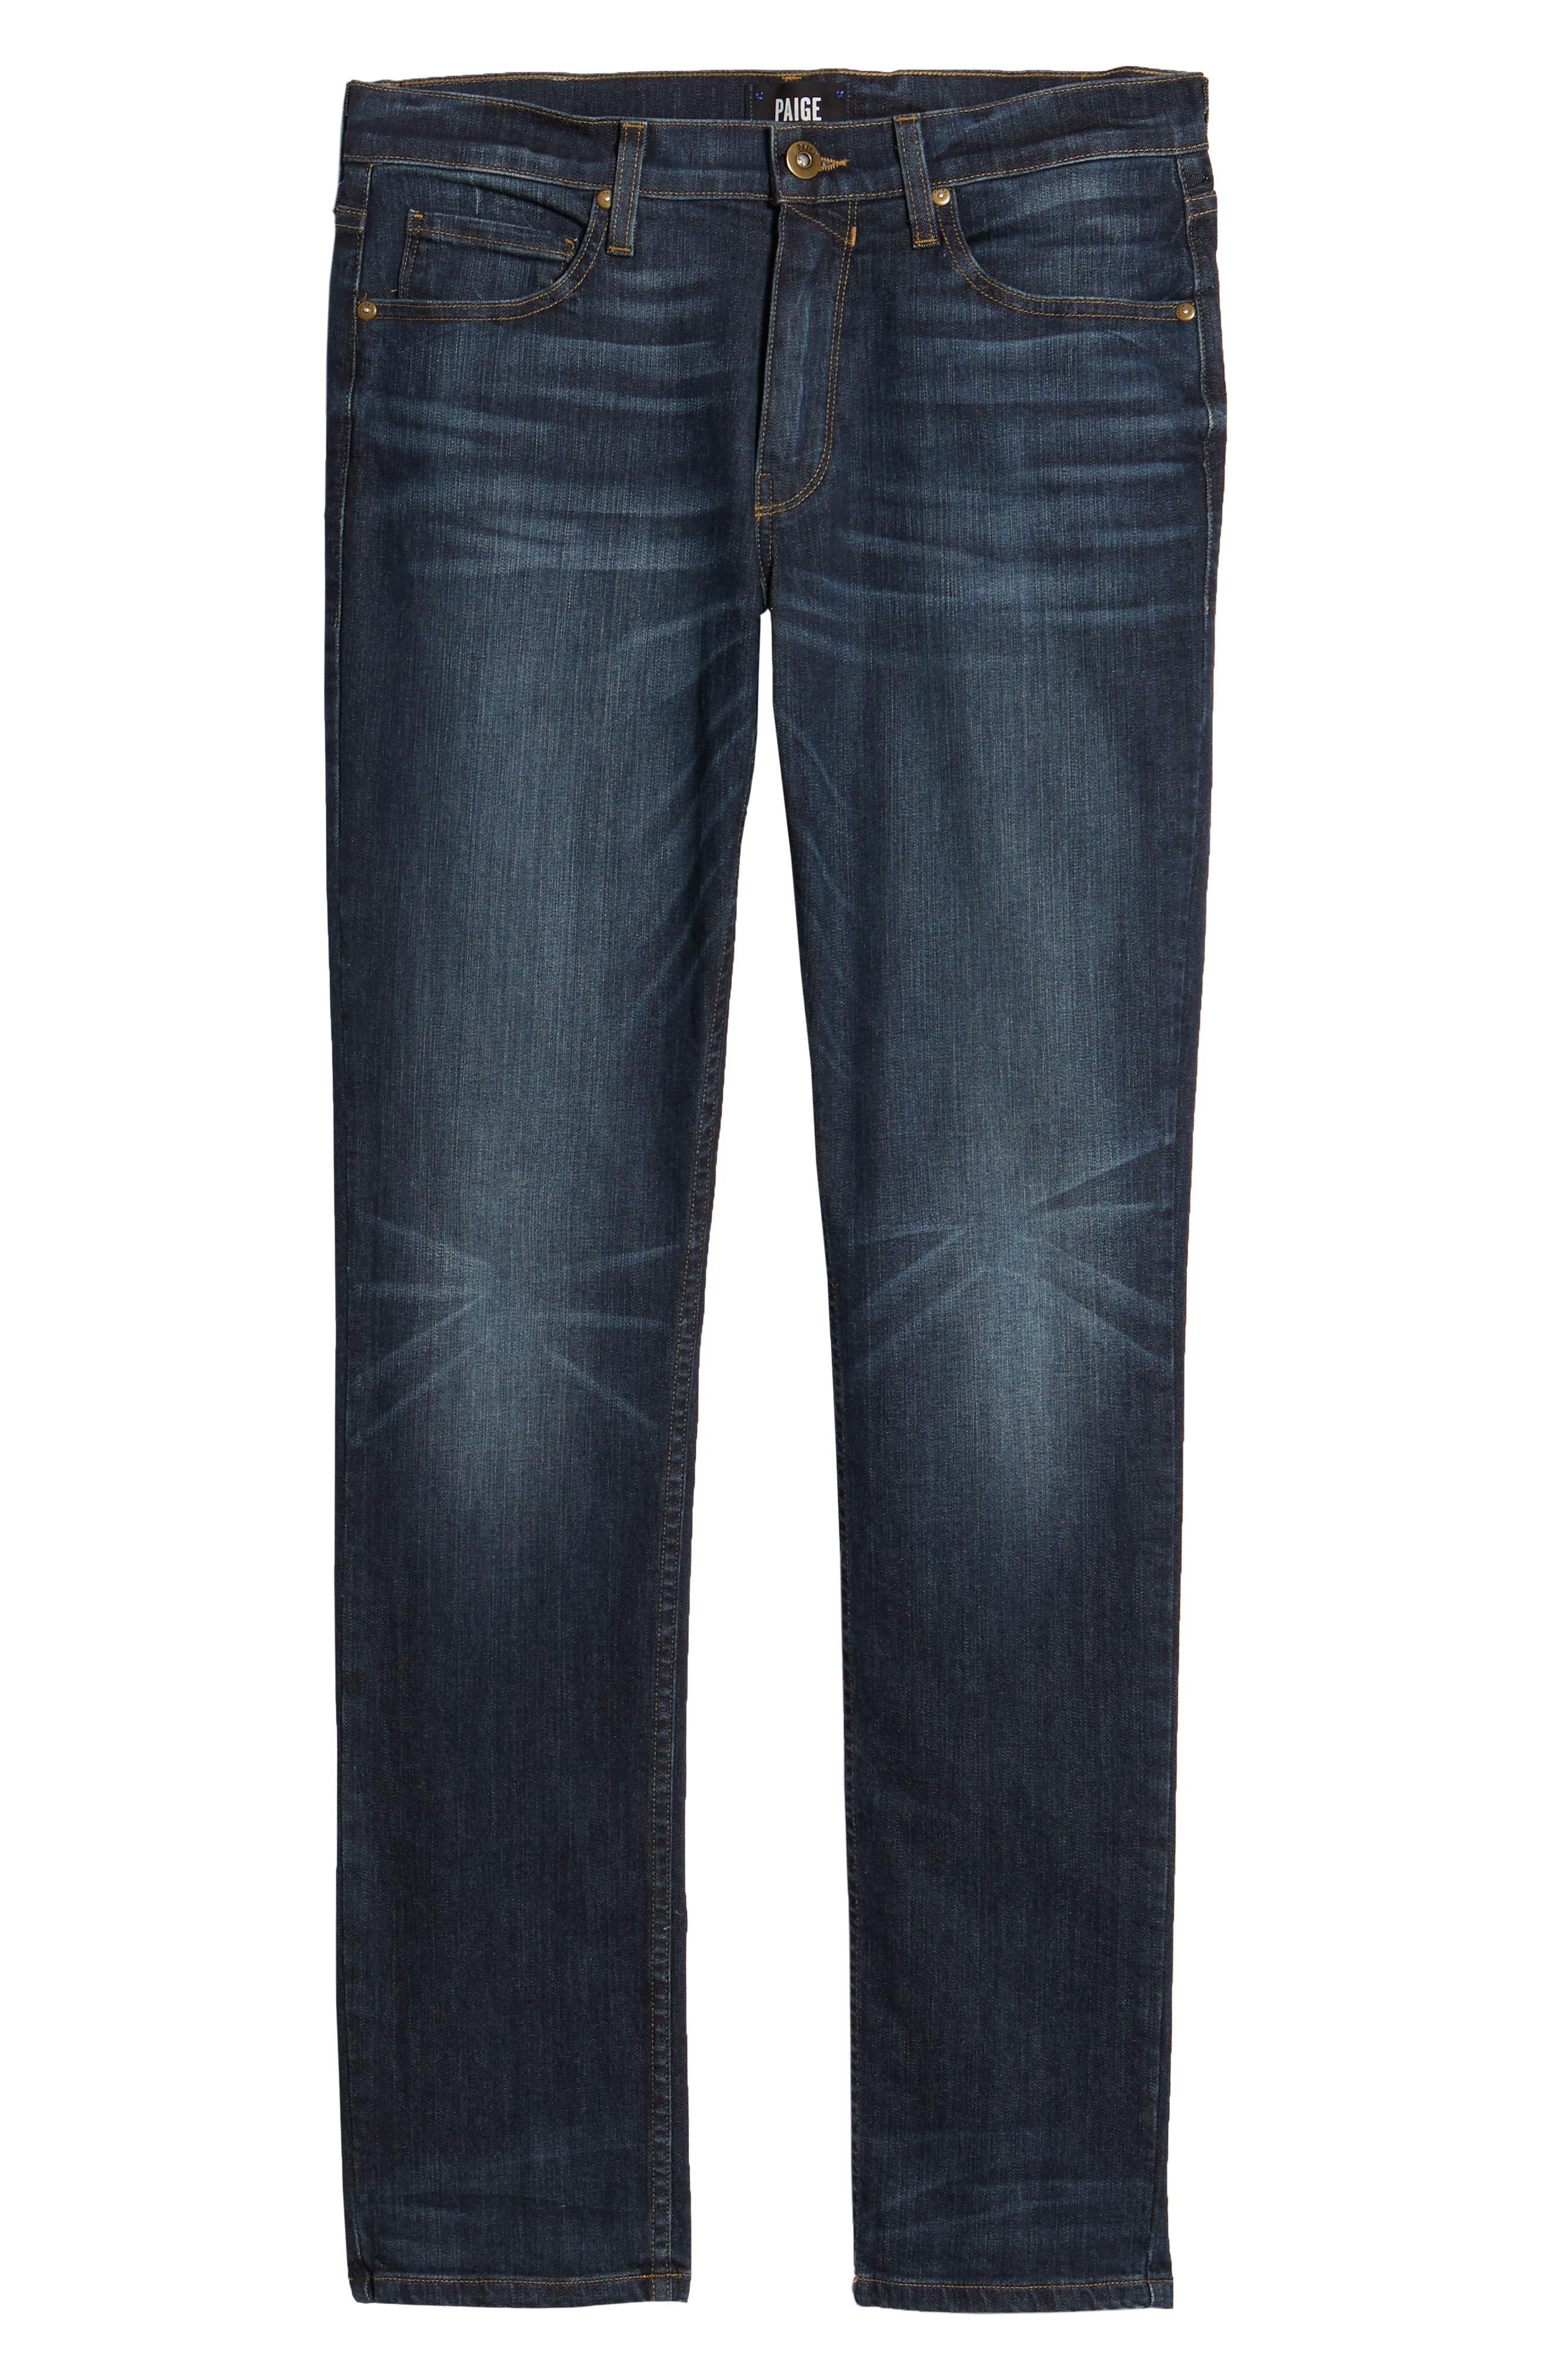 Transcend - Lennox Slim Fit Jeans,                             Alternate thumbnail 6, color,                             Hestan